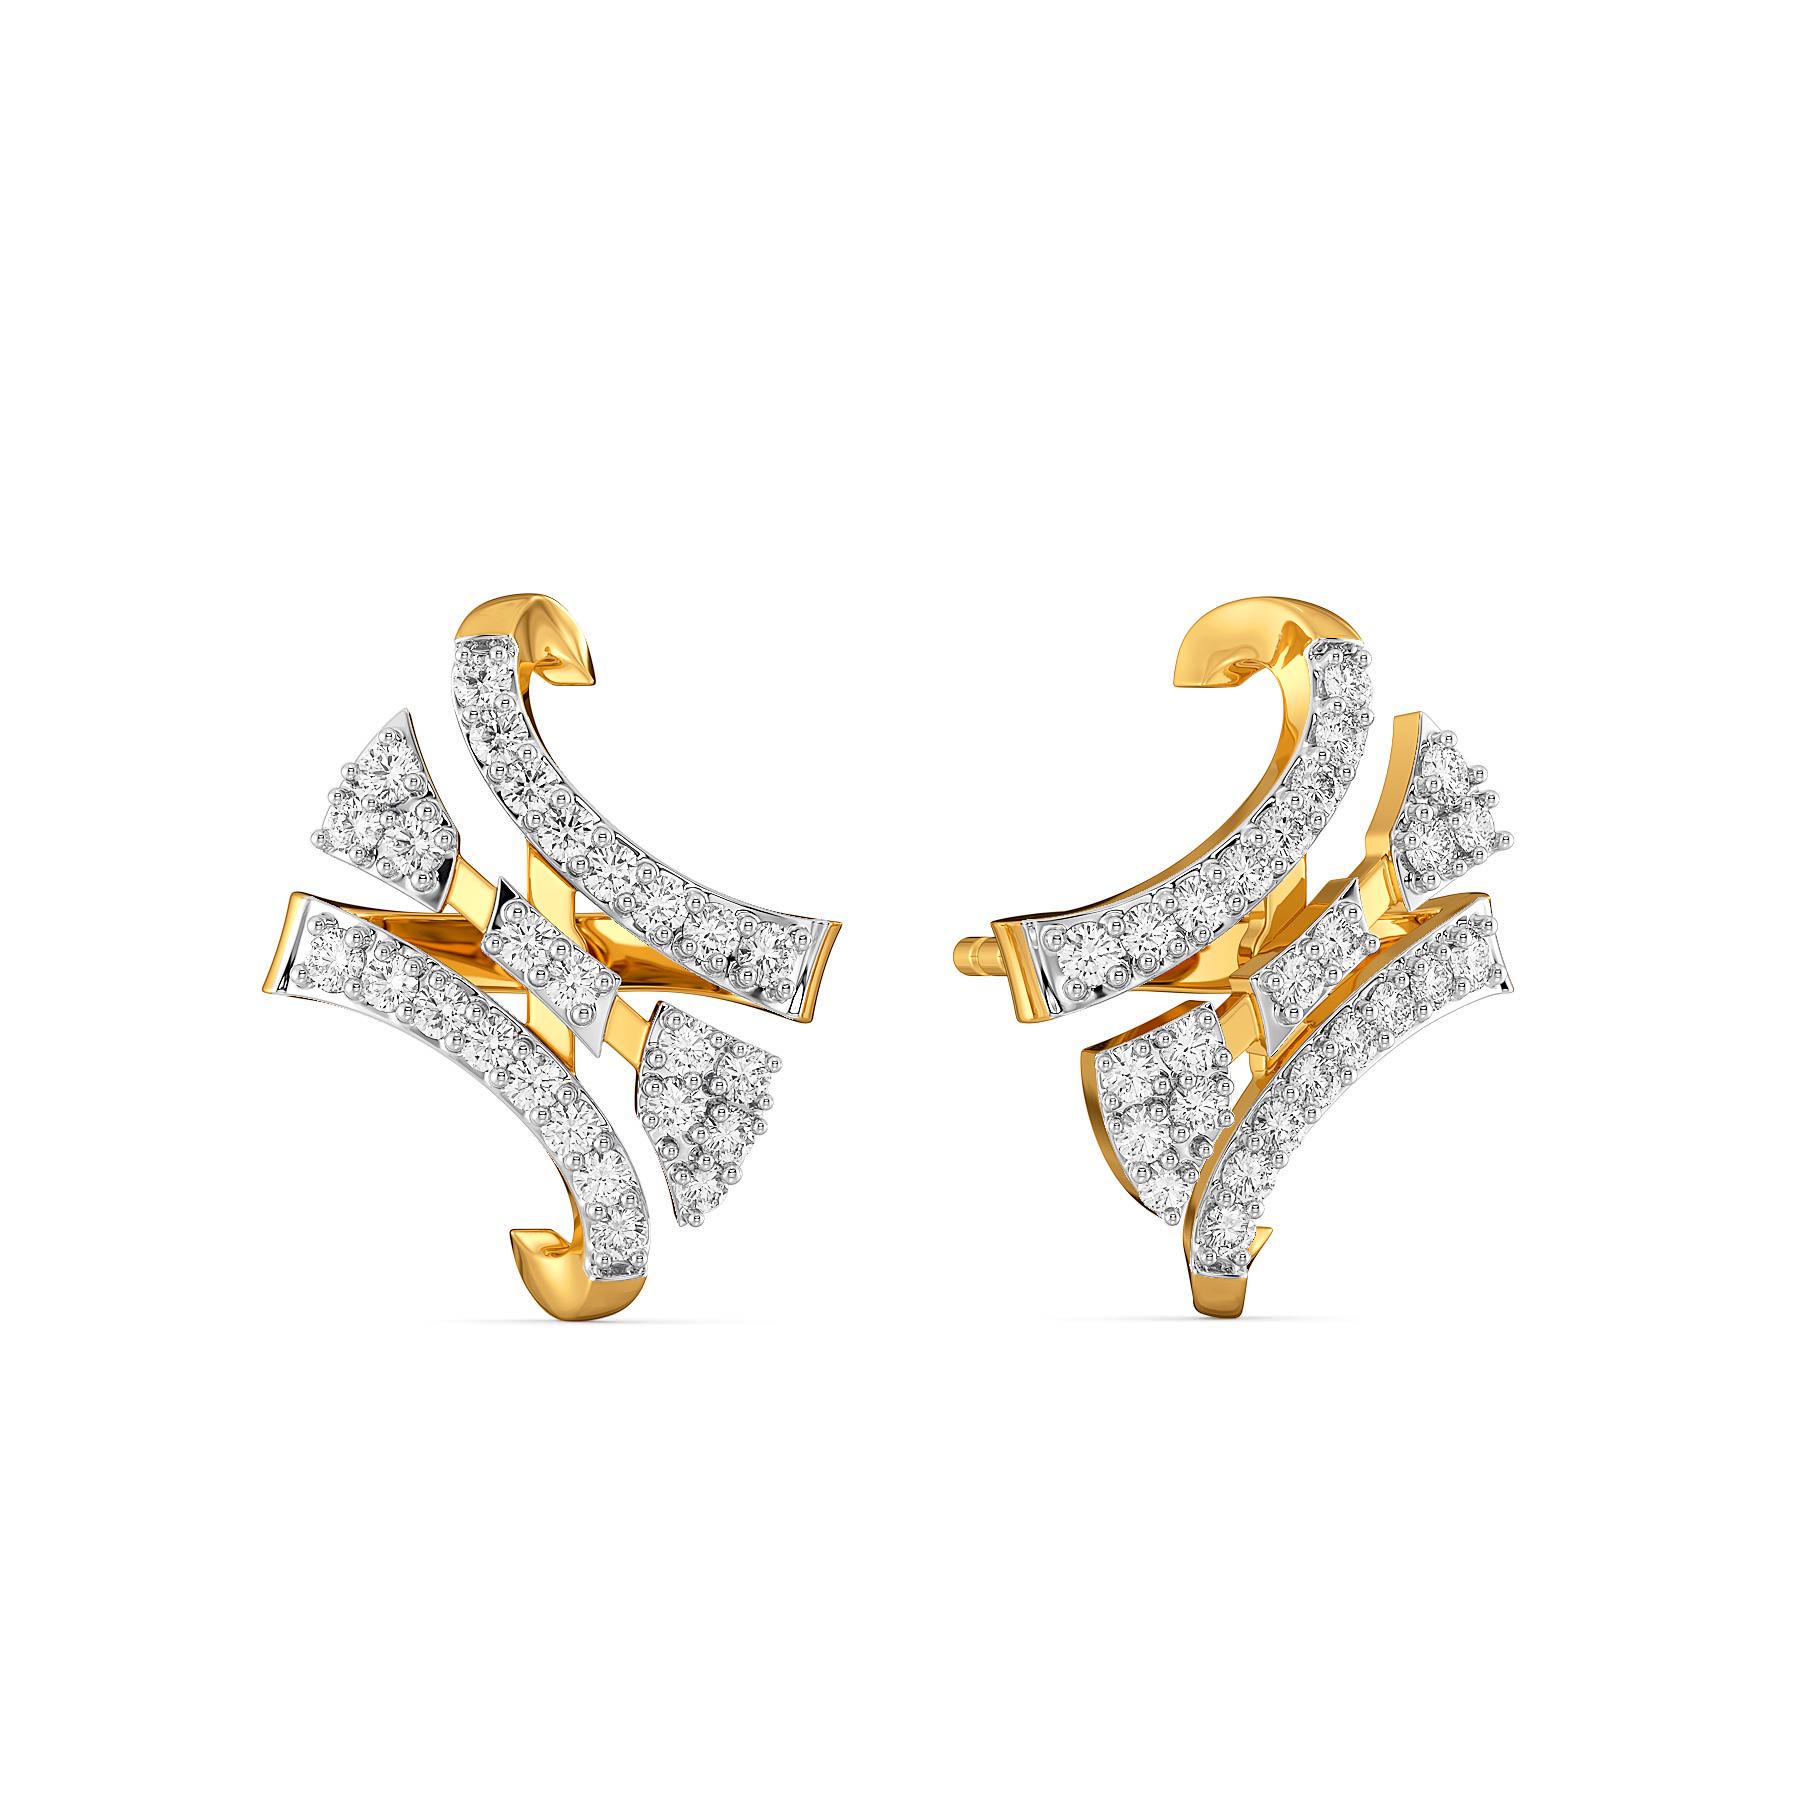 Chic Confetti Diamond Earrings